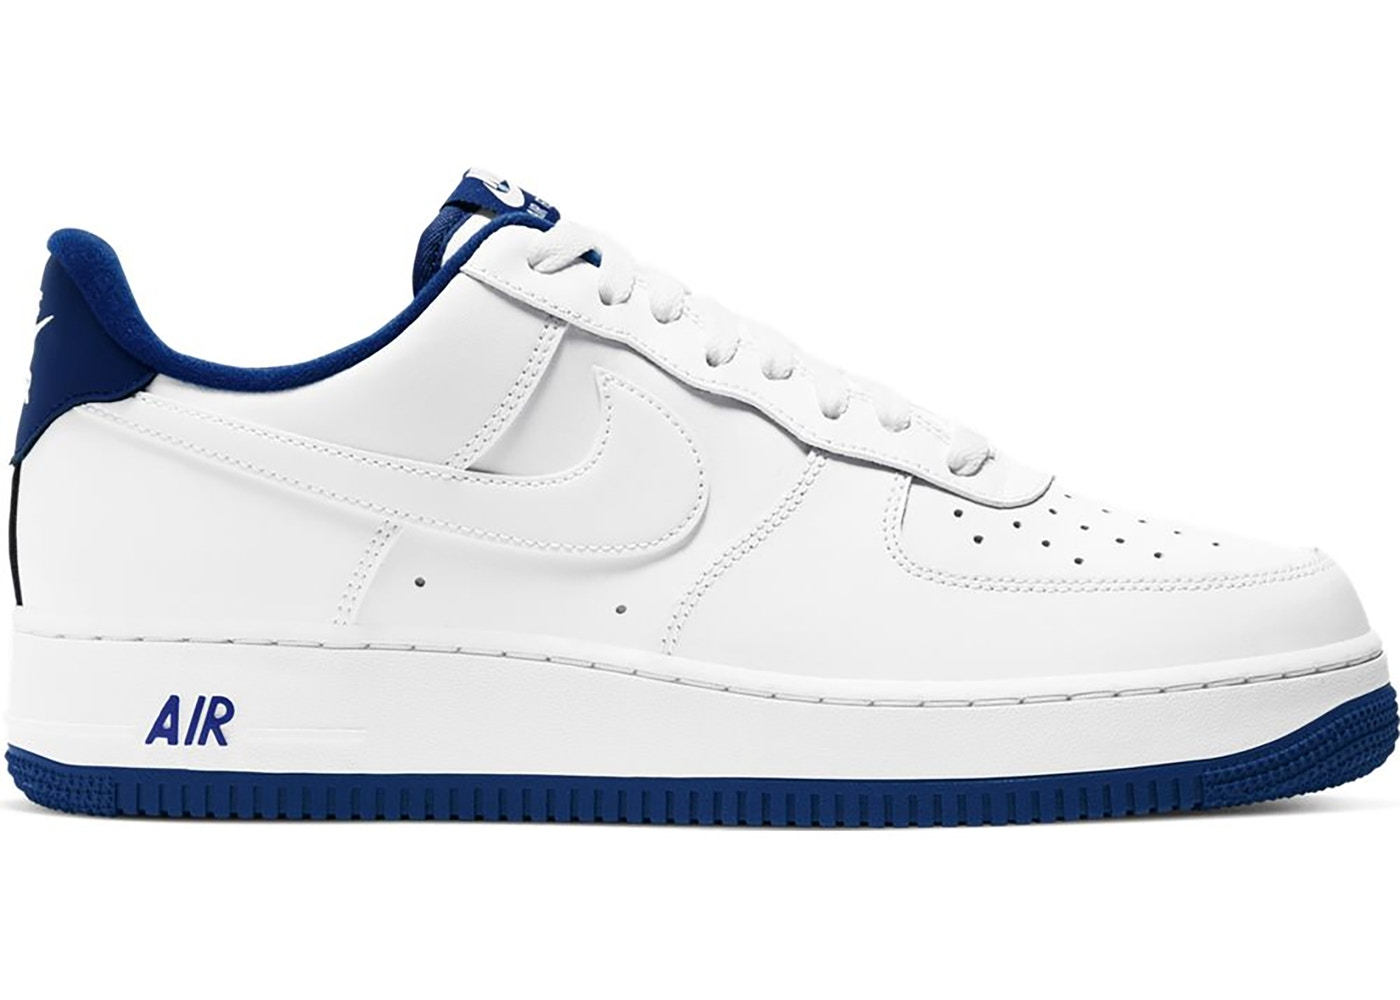 Nike Air Force 1 Low White Deep Royal Blue